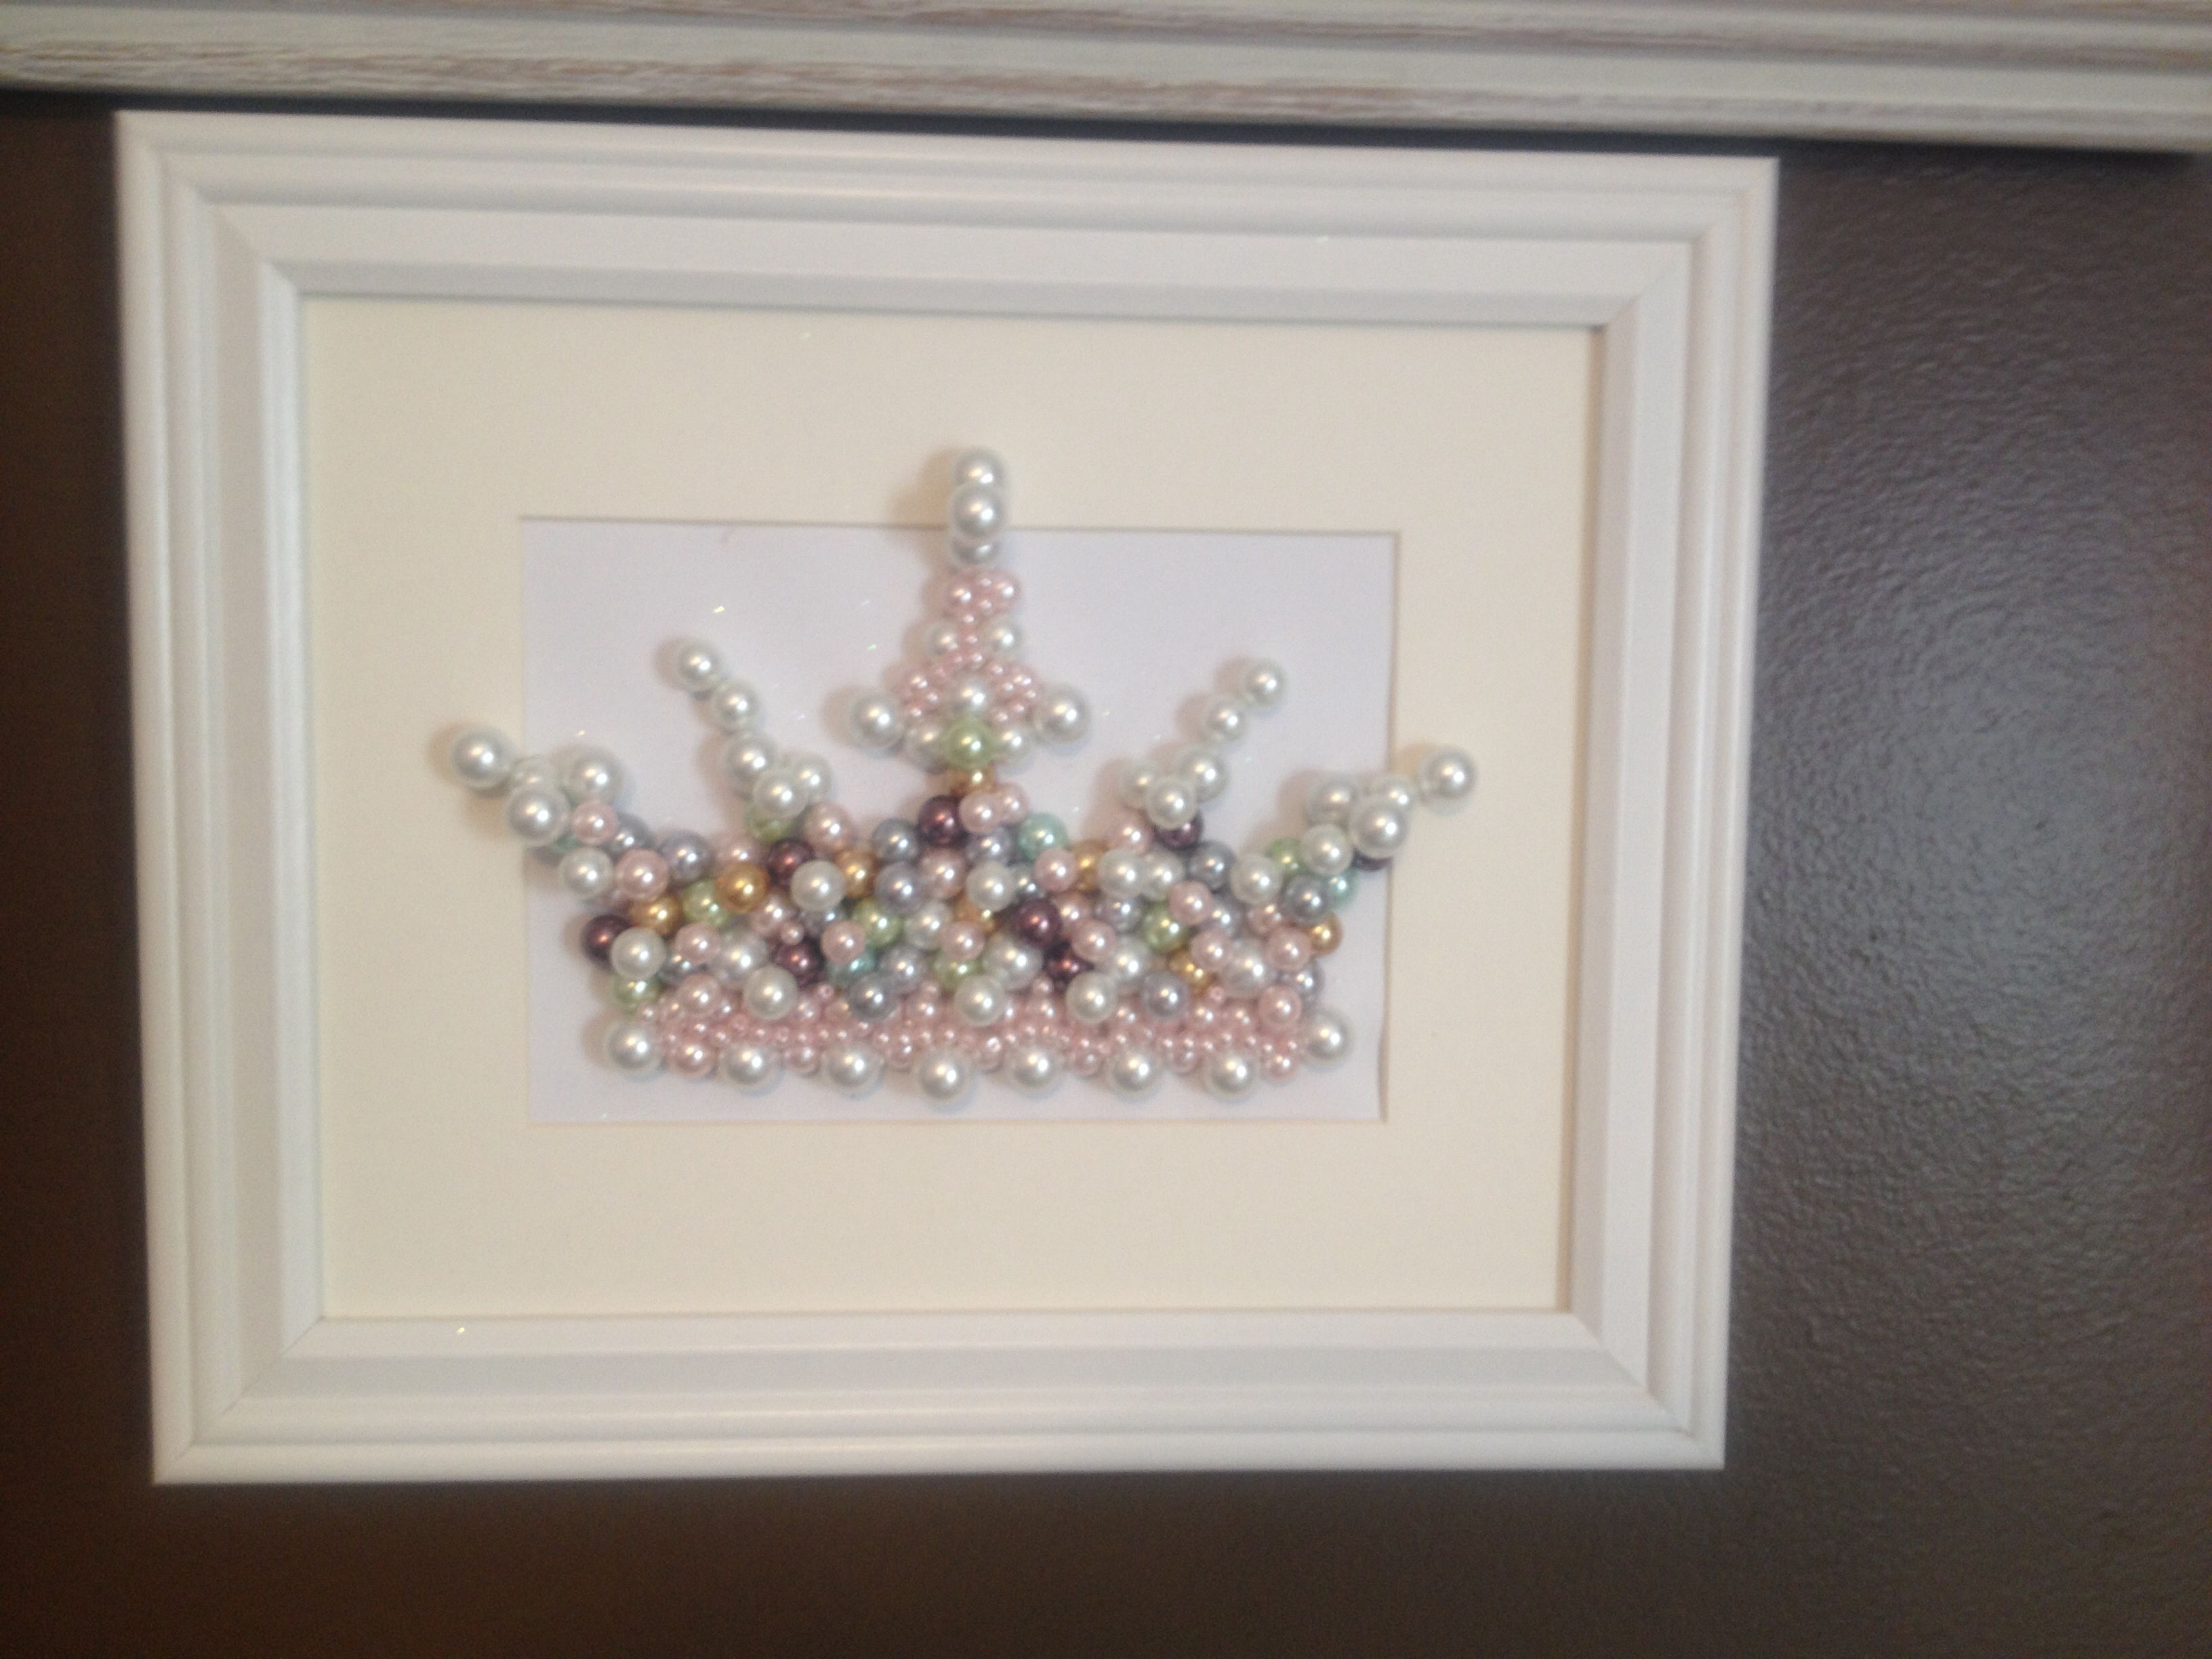 Princess Tiara Wall Decor For The Home S Bedroom